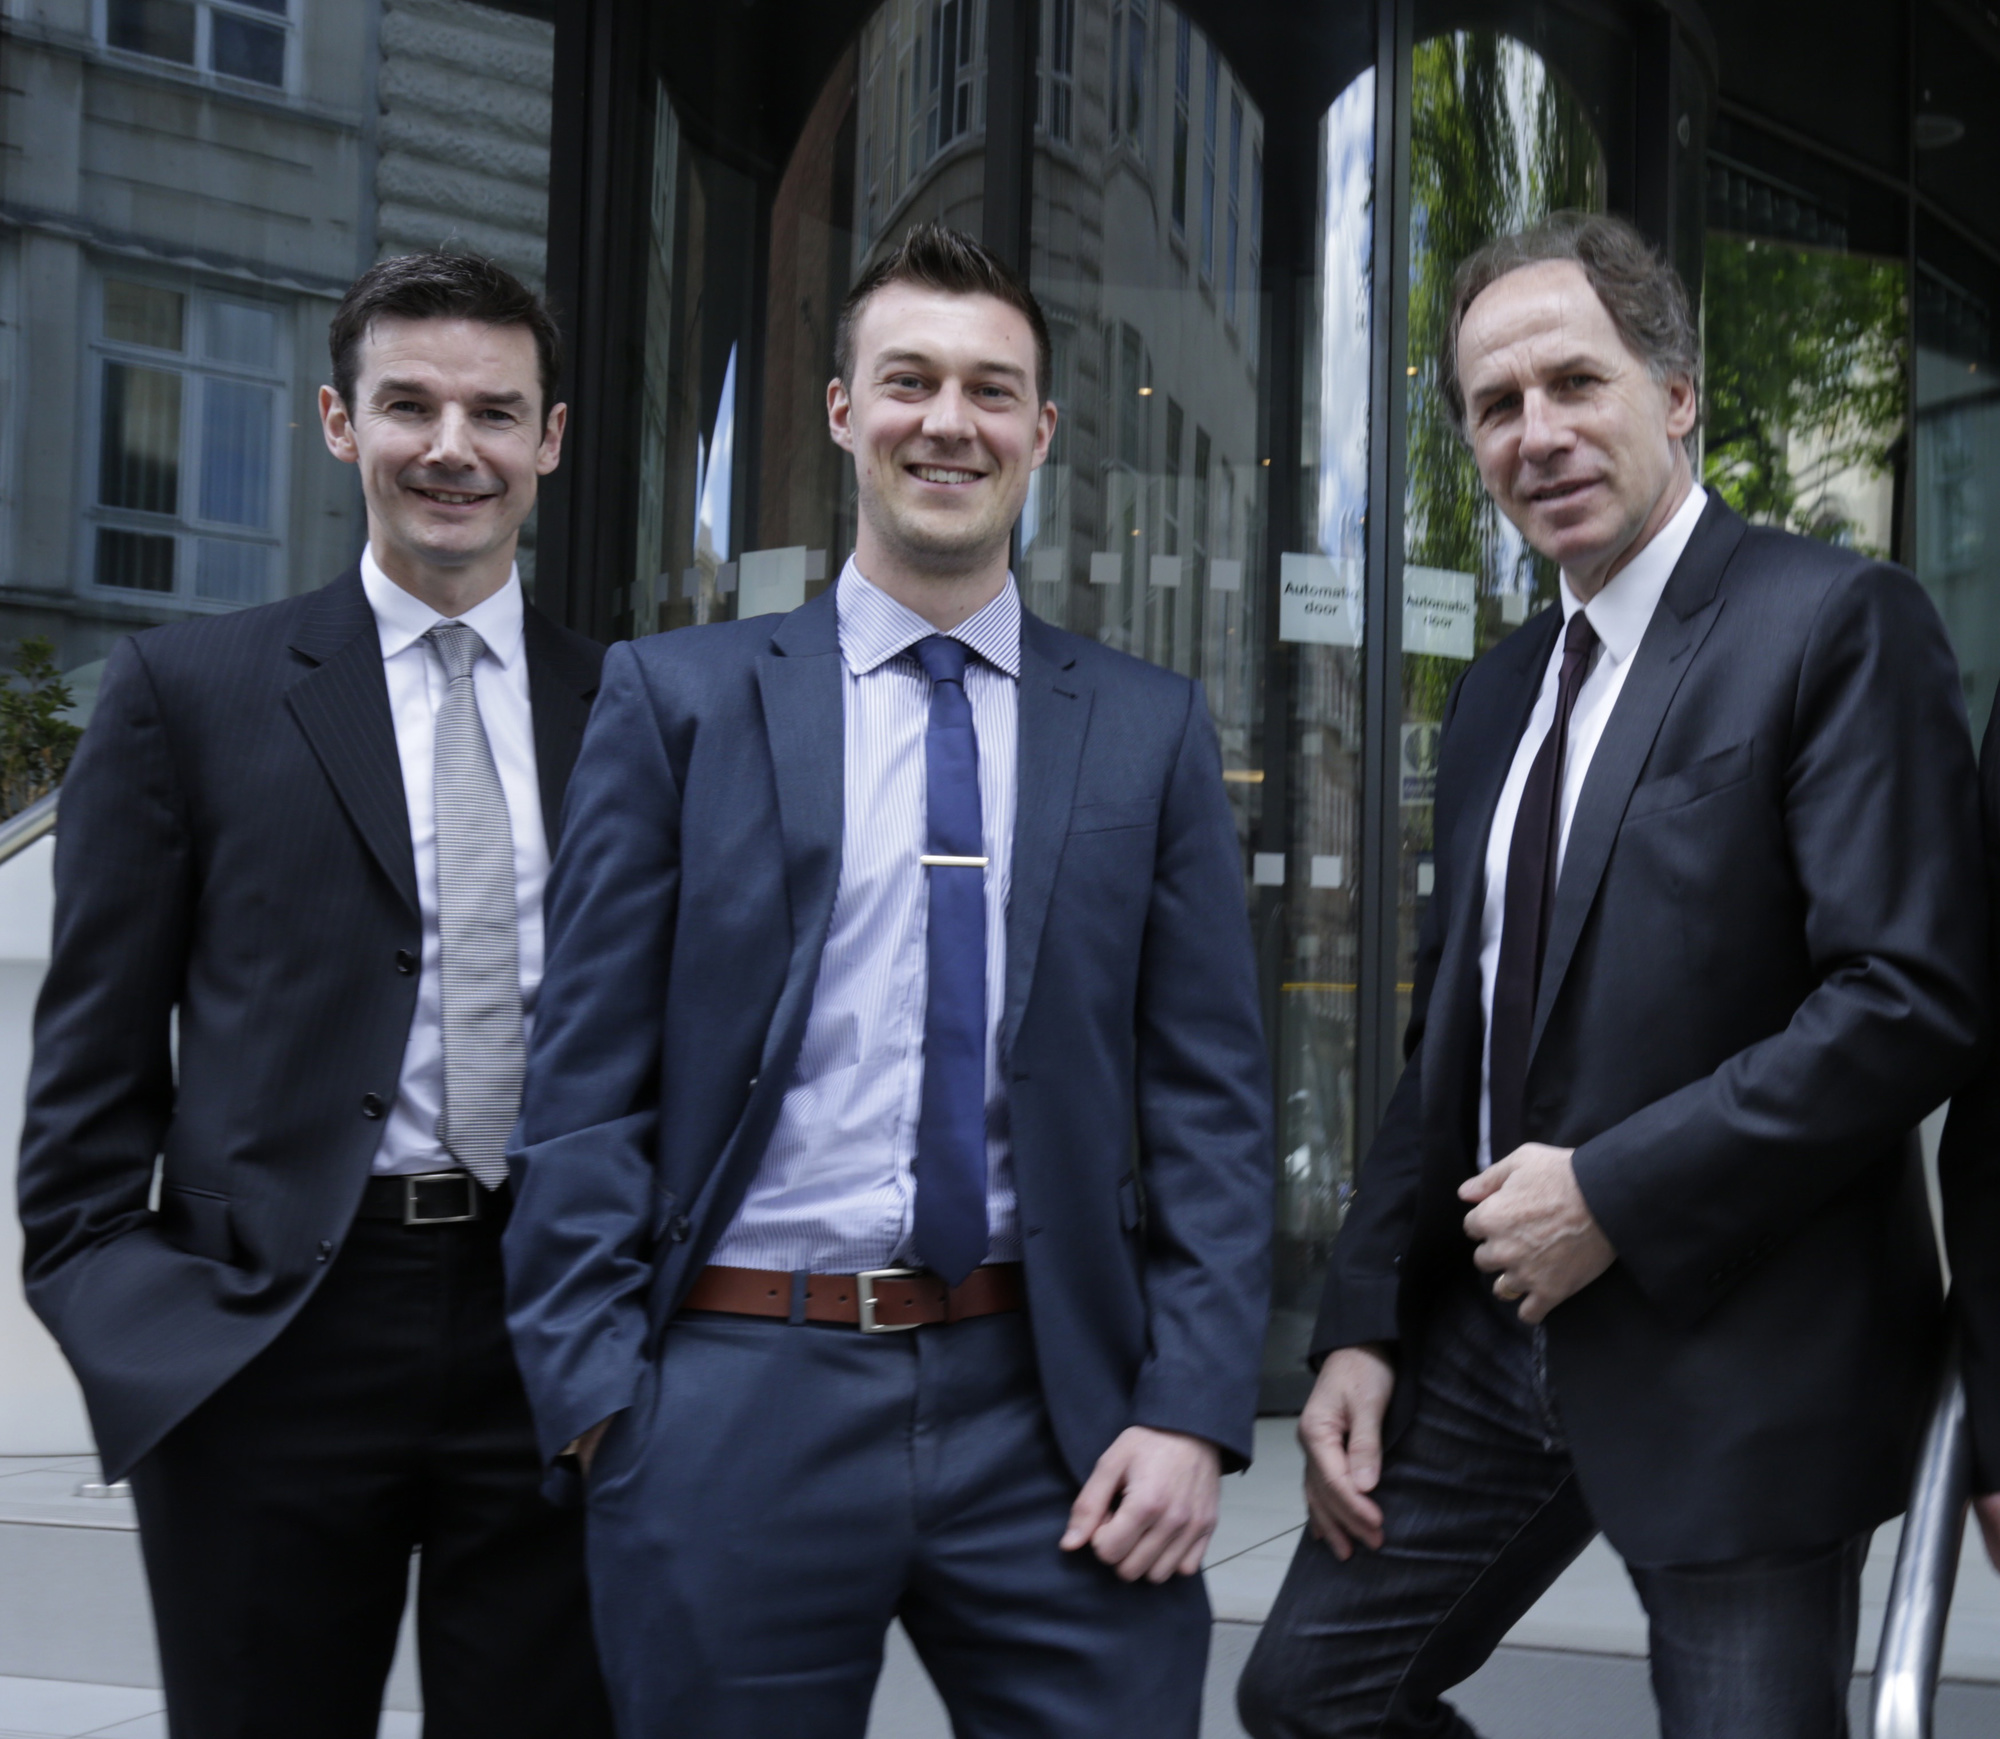 John Devine, Anthony Coultas and Franco Baresi